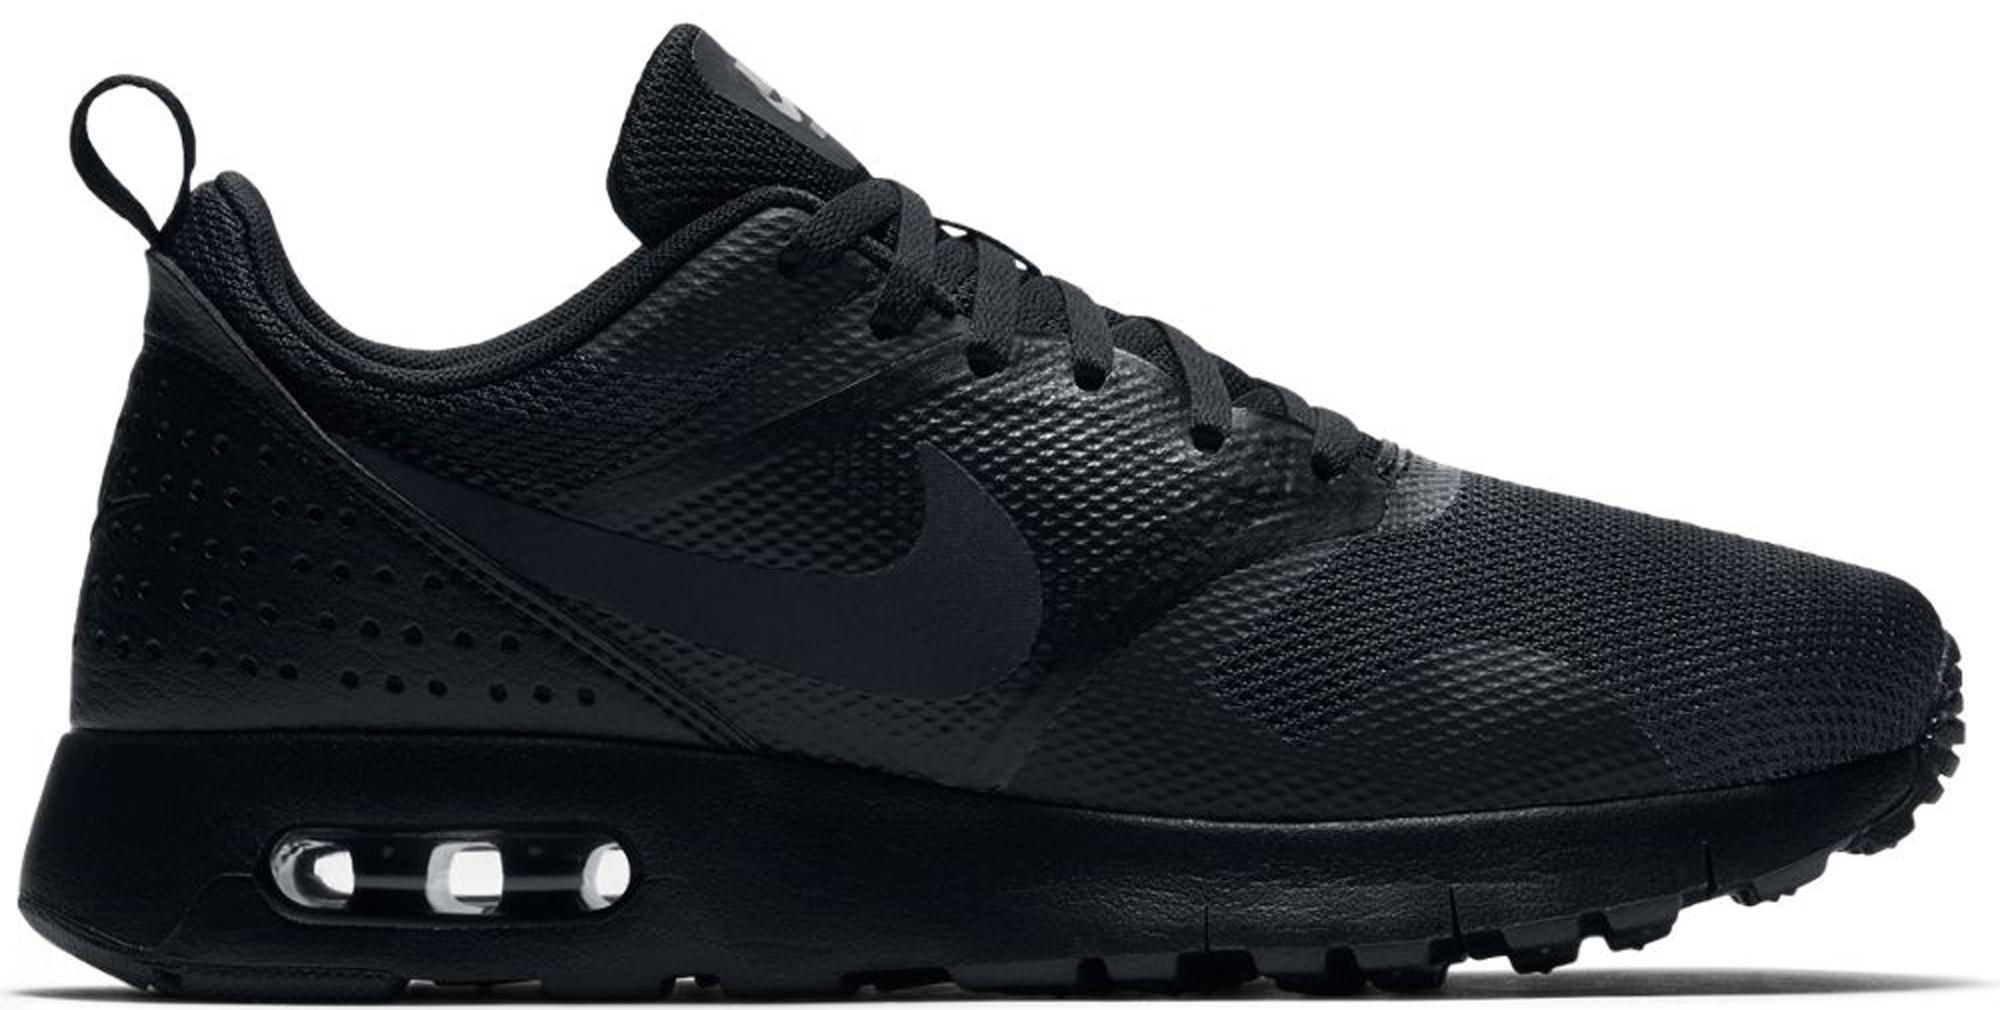 Nike Air Max Tavas Black (GS) - 814443-005